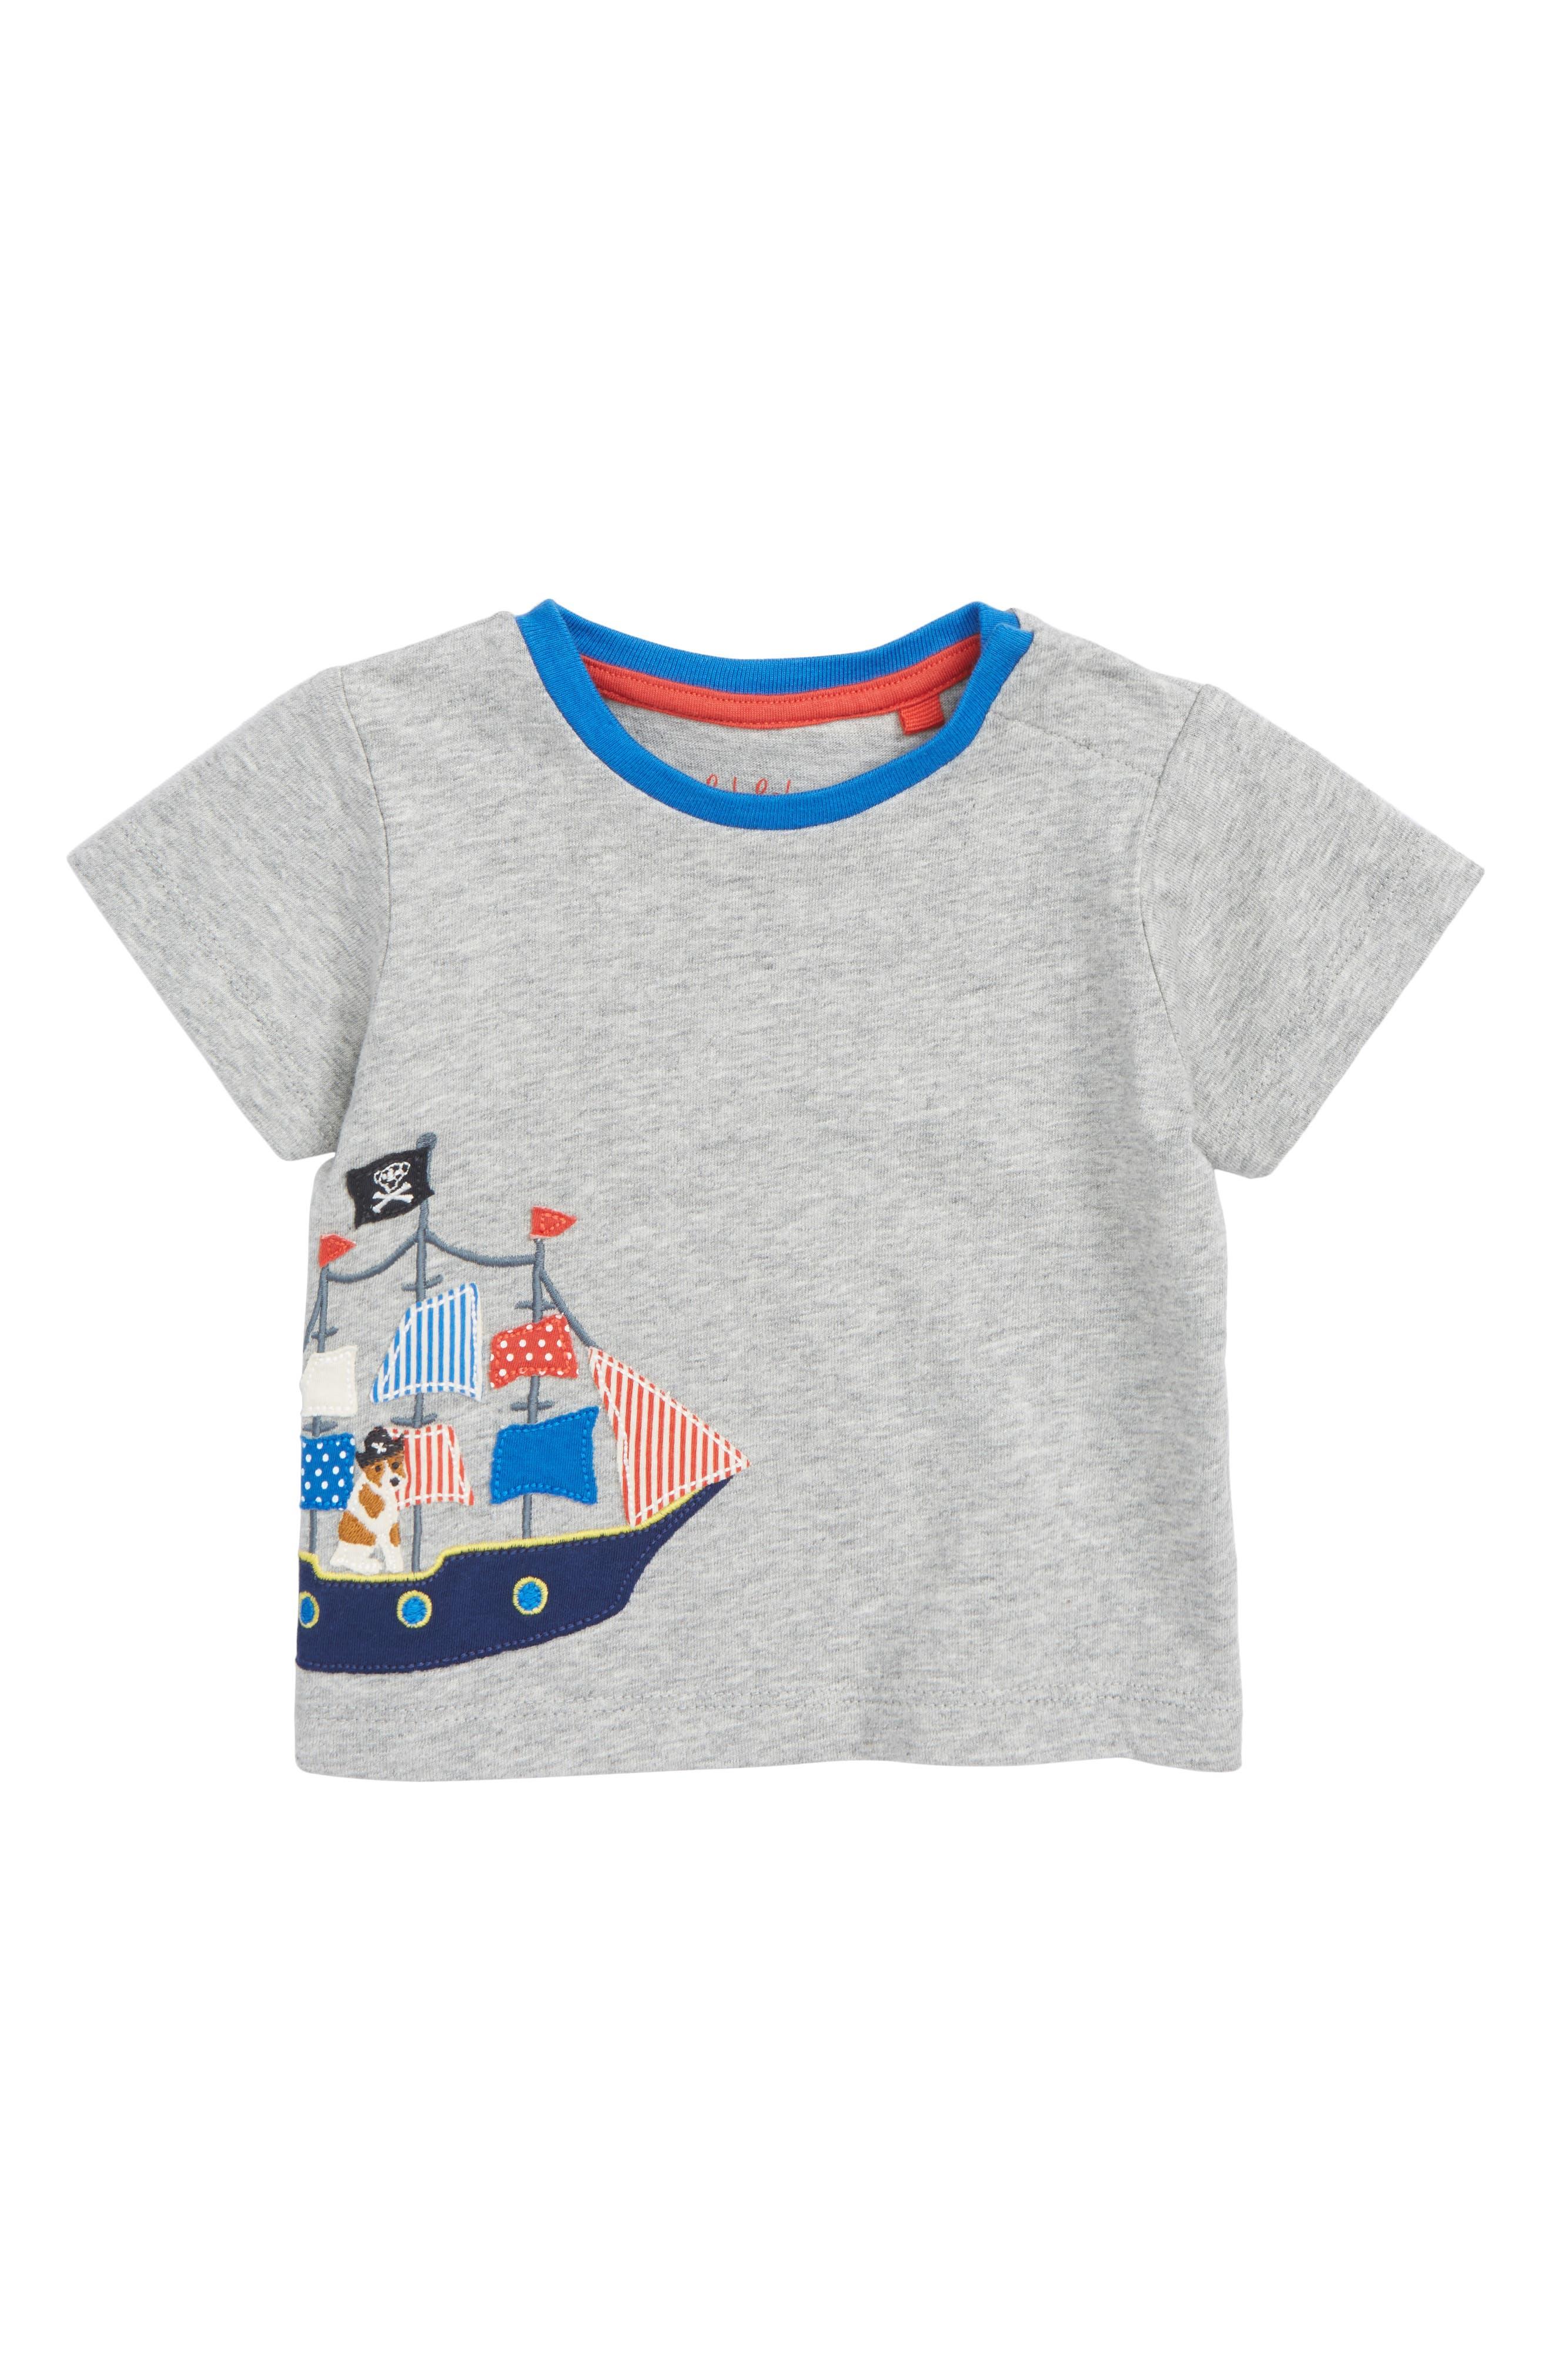 Sea Adventure Appliqué T-Shirt,                             Main thumbnail 1, color,                             Grey Marl/ Pirate Ship